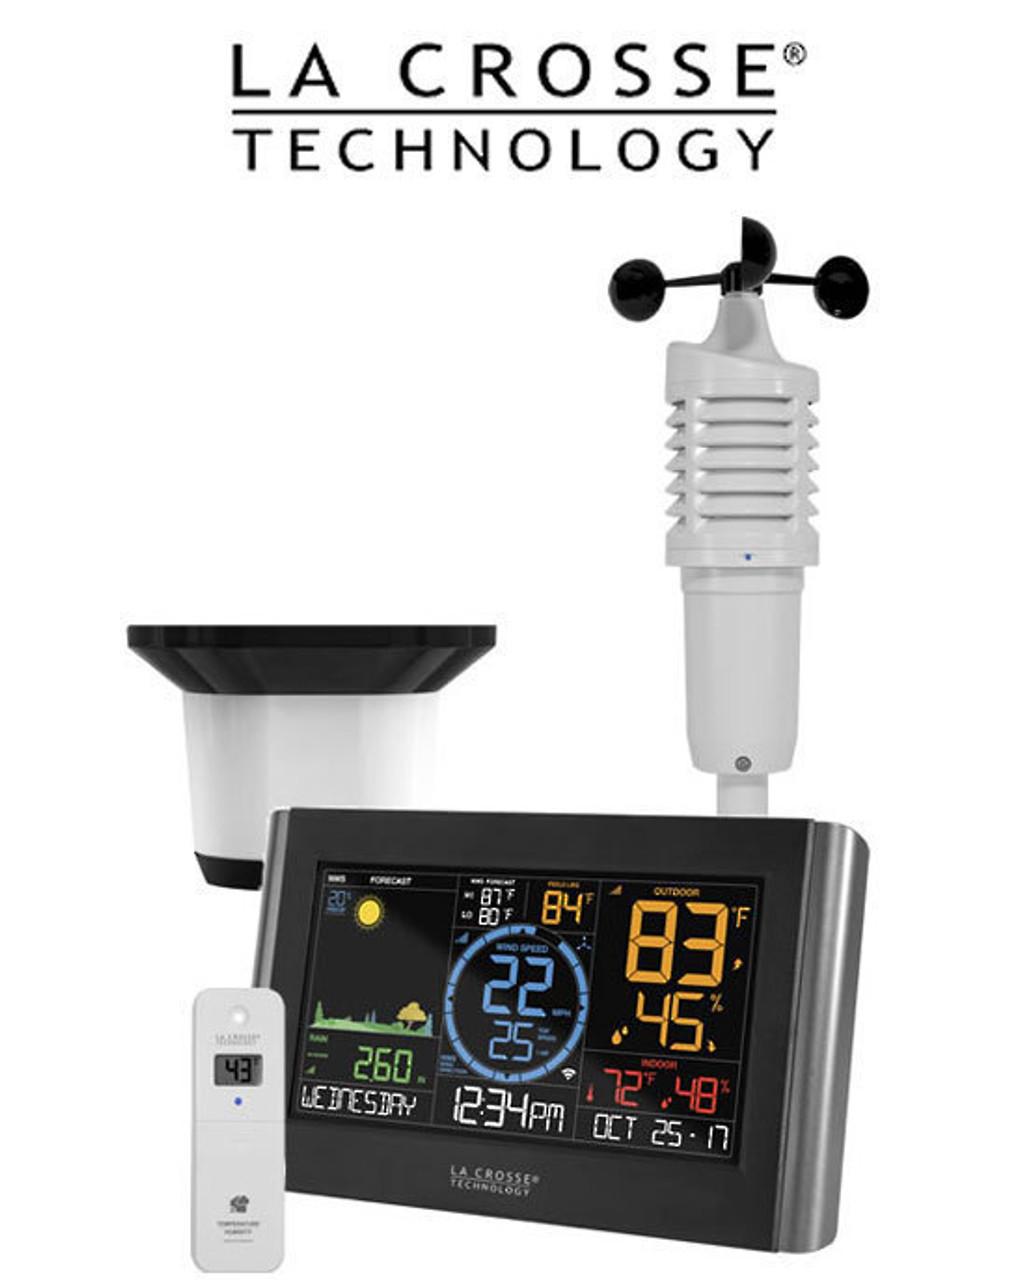 La Crosse V22-WRTH Professional WiFi Colour Weather Station